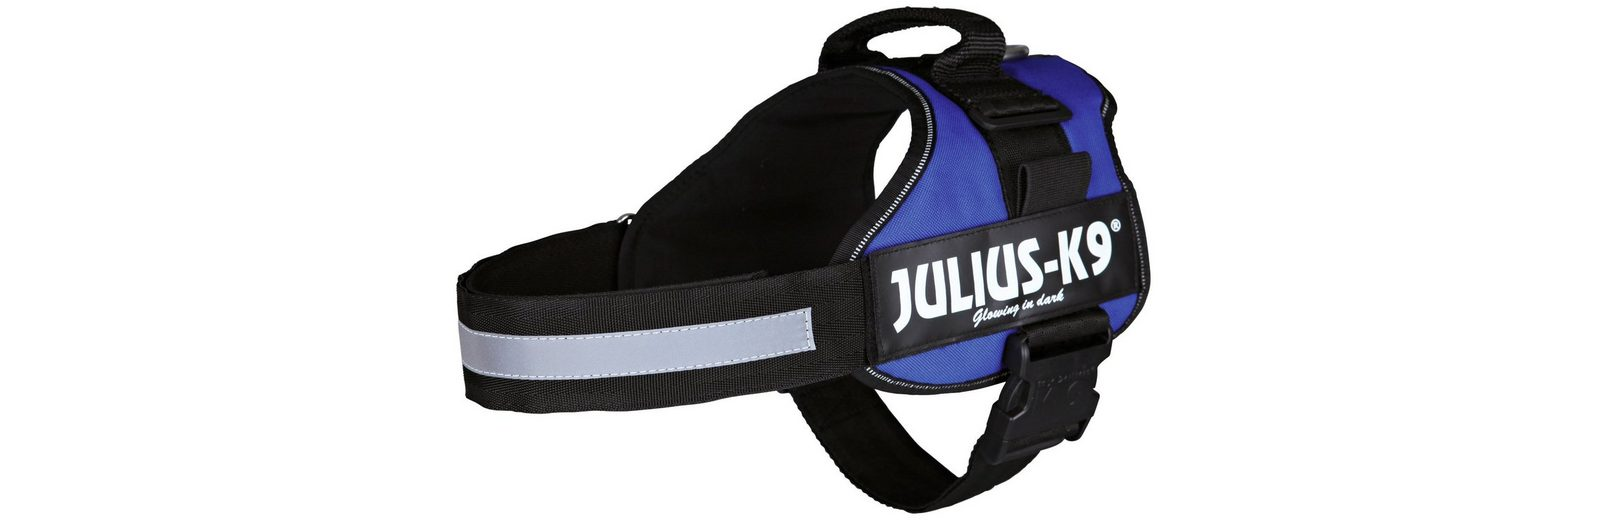 Hunde-Geschirr »Julius-K9 1/L«, blau, 66-85 cm